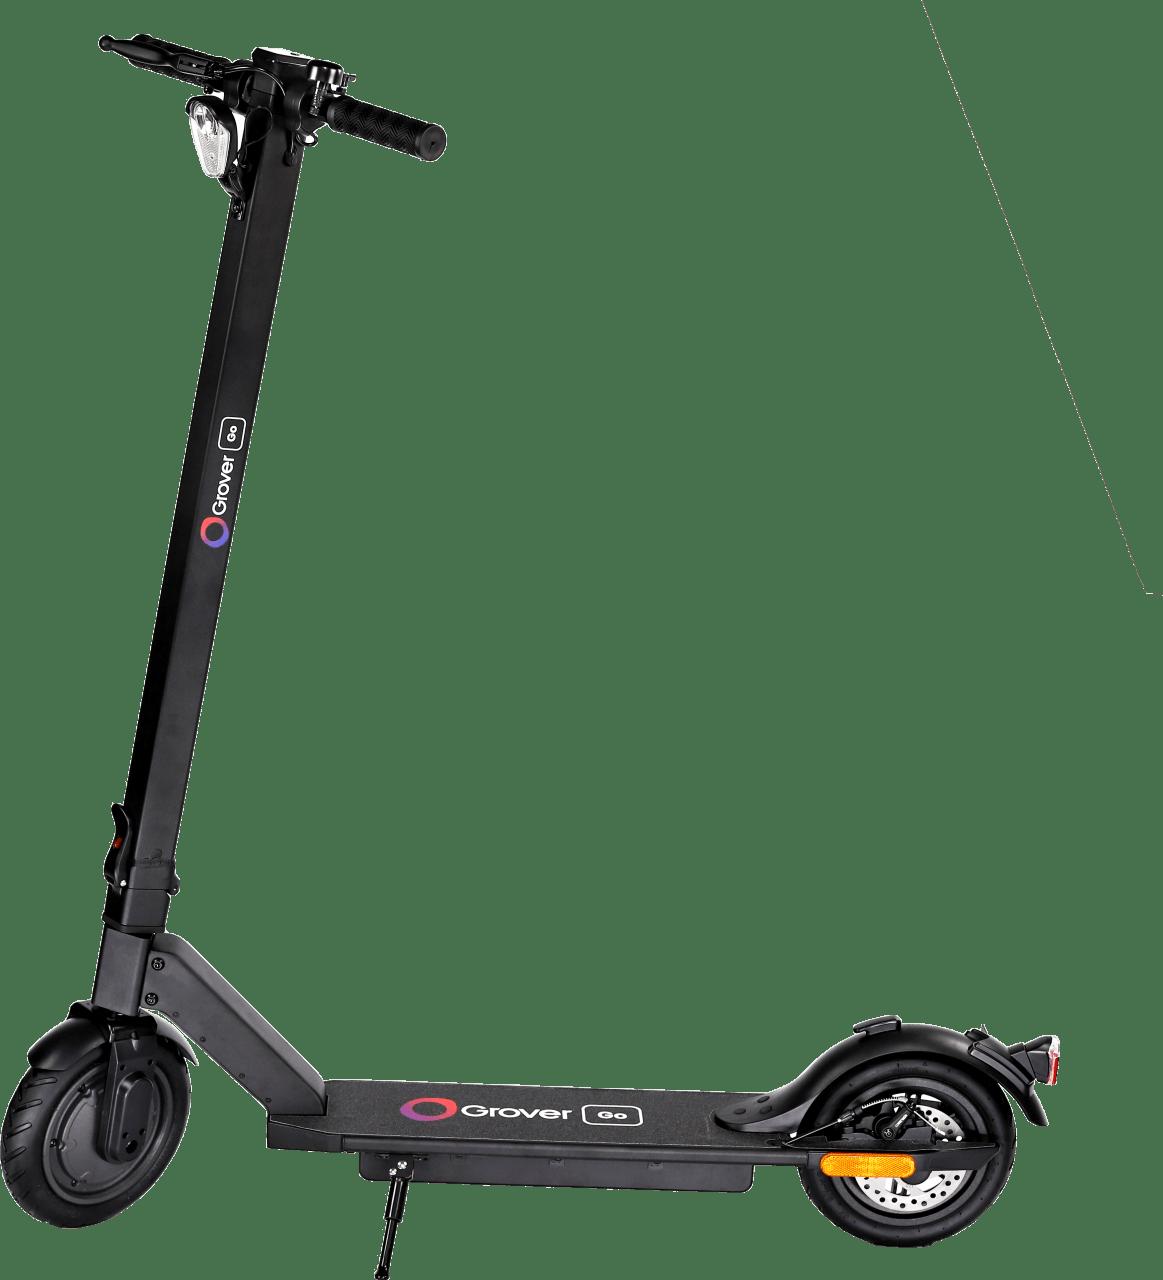 Schwarz GroverGo Scooter.3